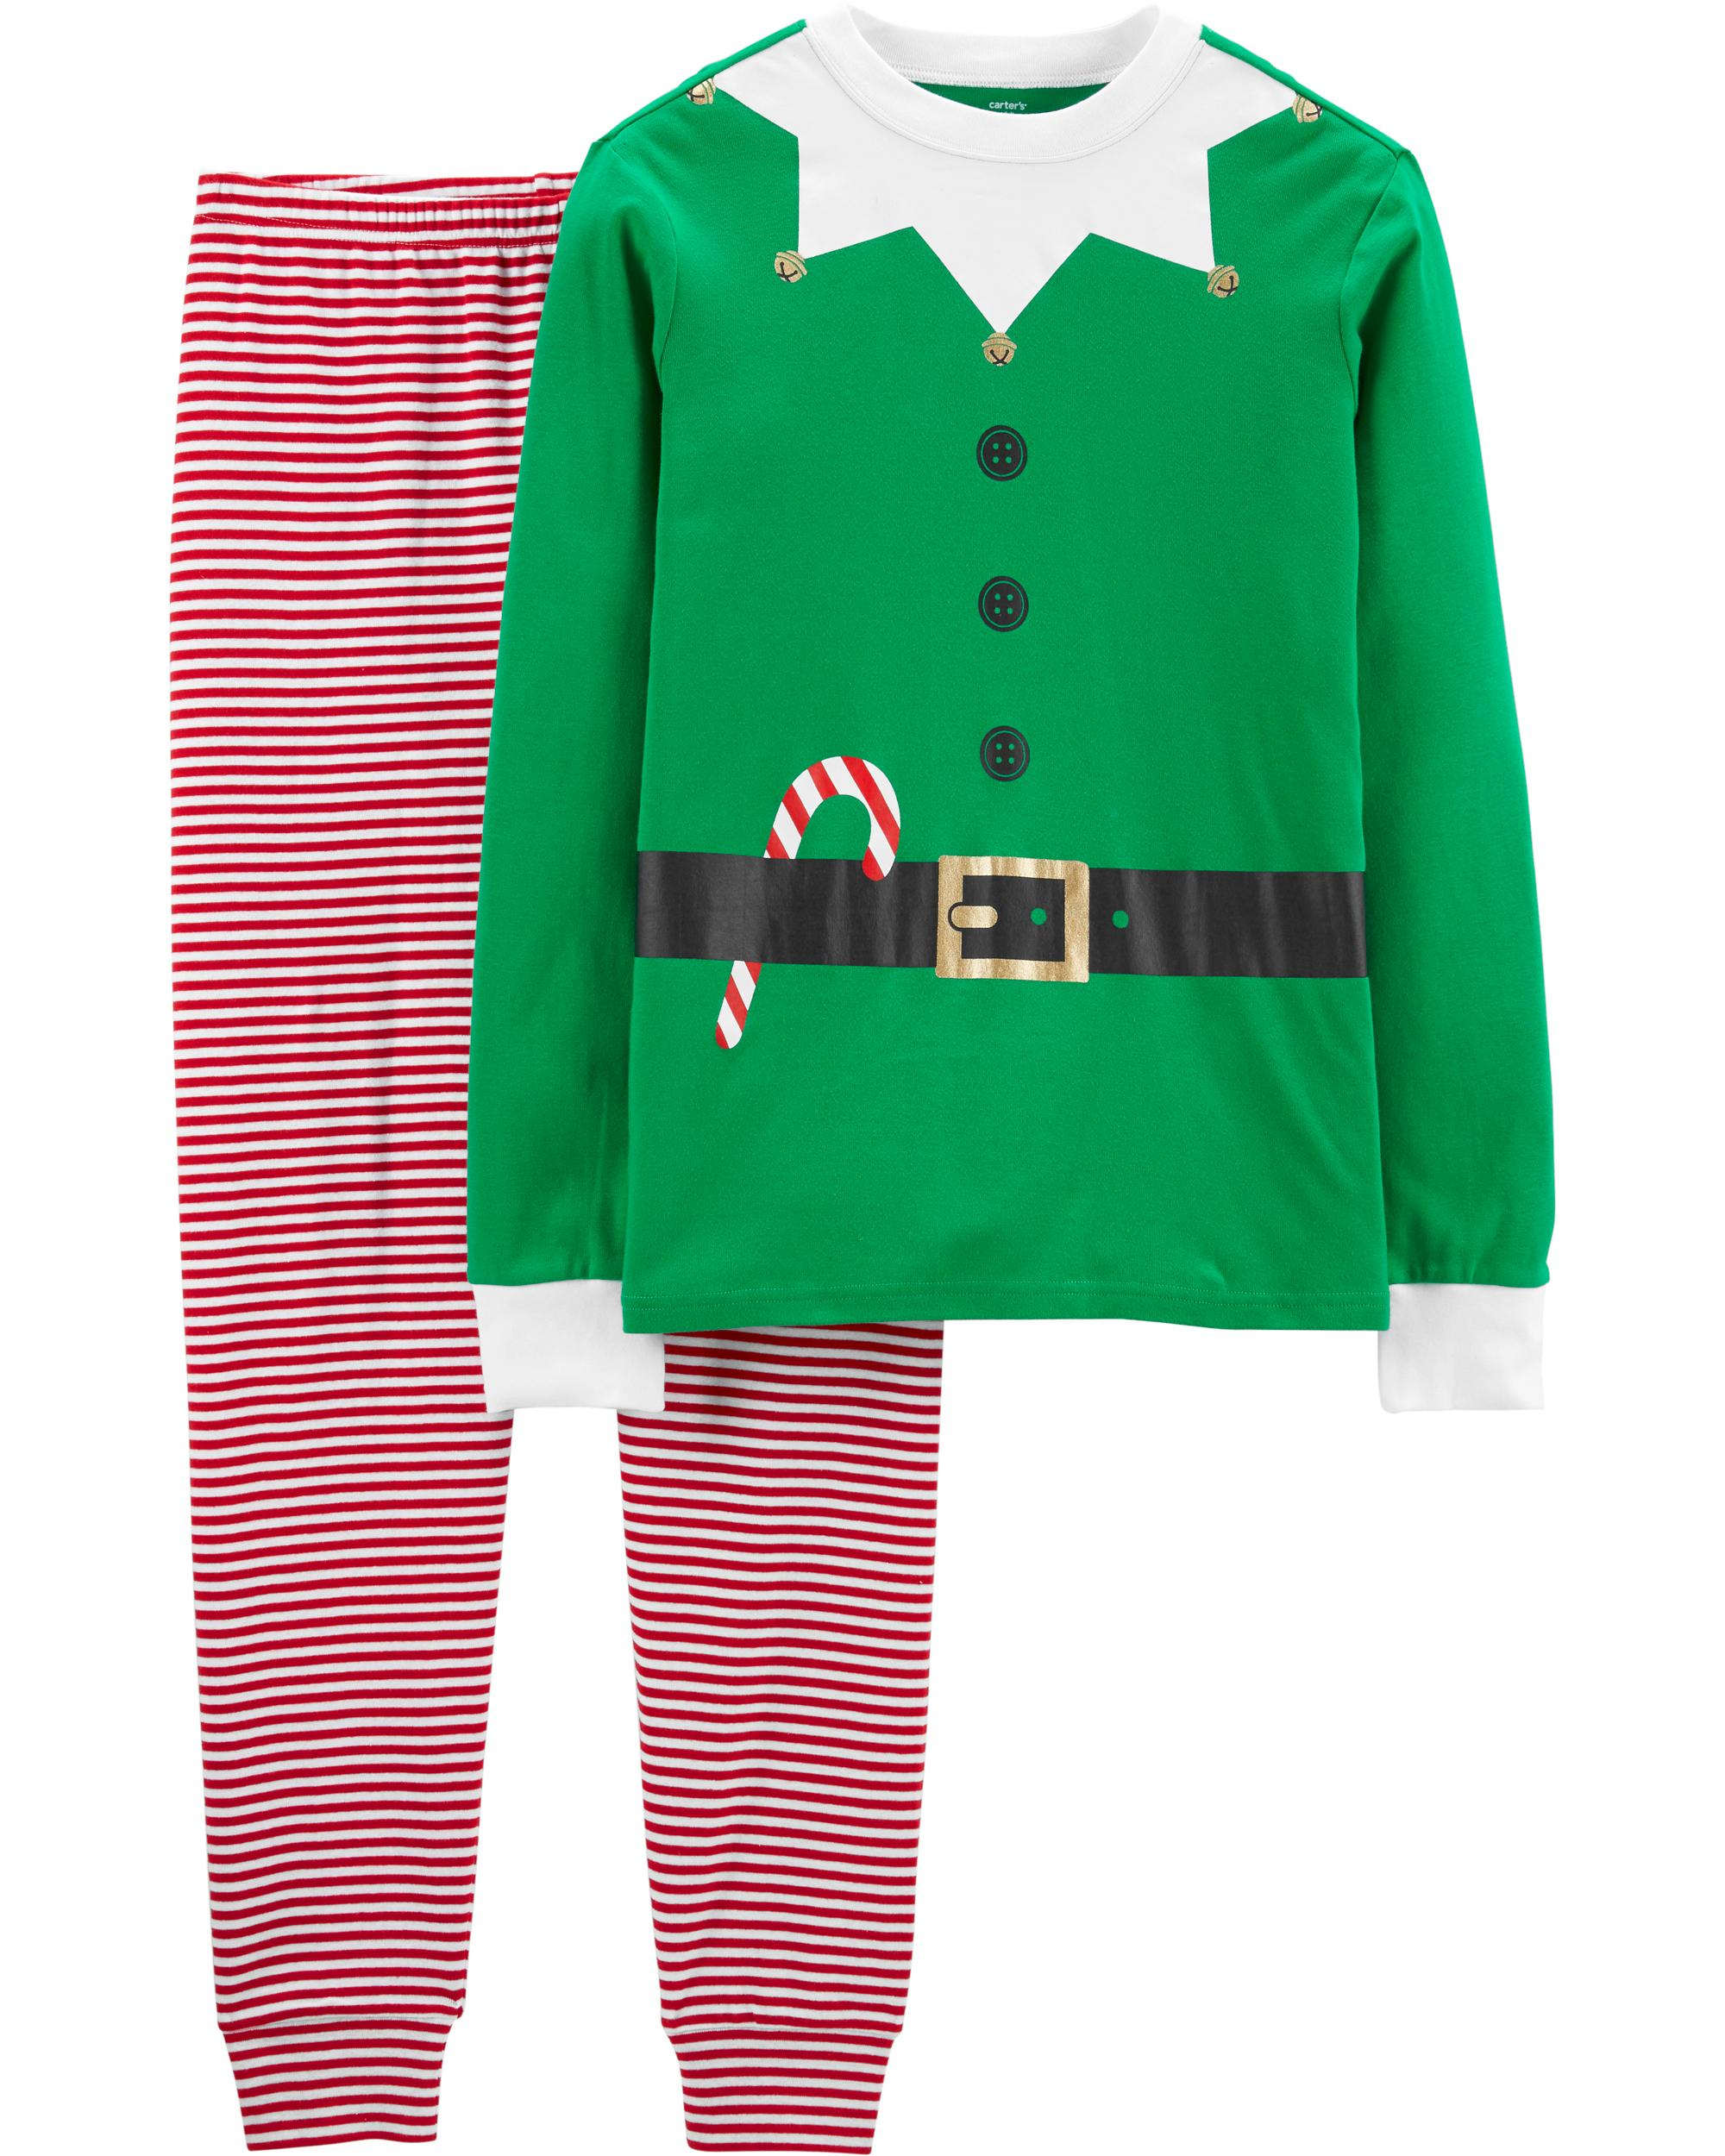 32bd46b28d84c Family Matching Holiday Elf Pajamas | carters.com